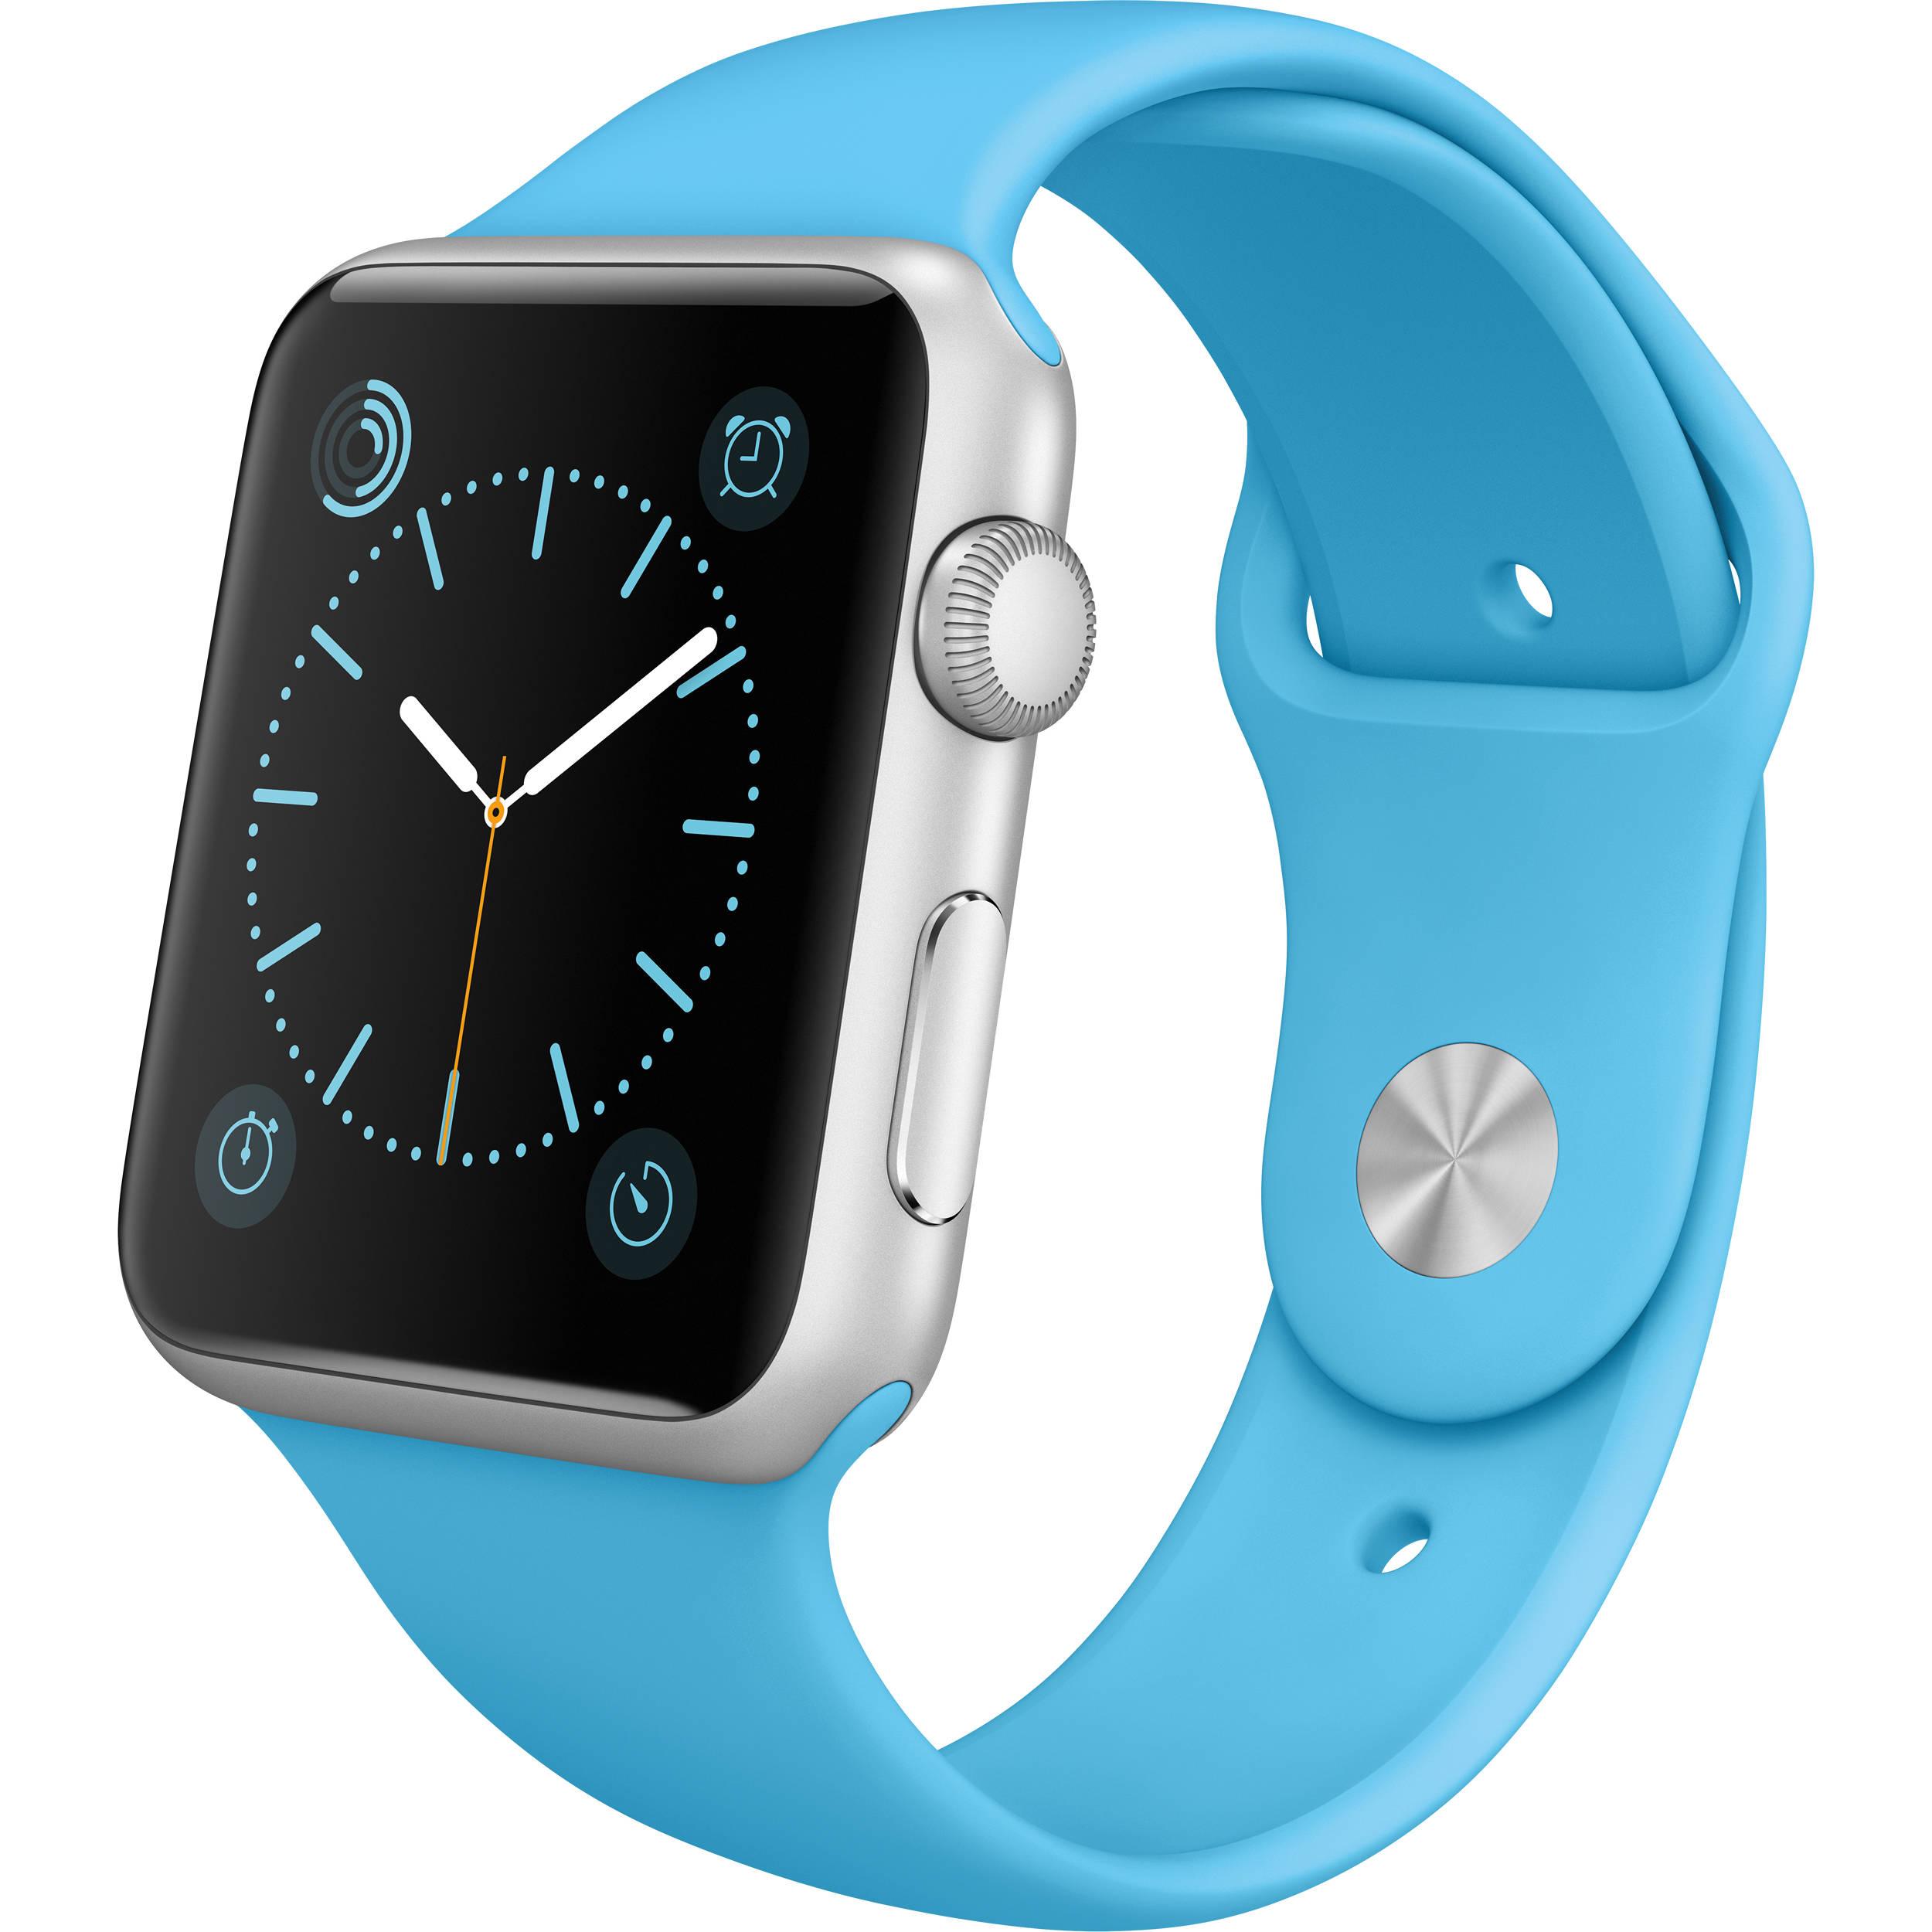 Apple Watch Sport 42mm Smartwatch Mlc52ll A Bh Photo Video Click Image For Larger Versionnameimg1634jpgviews268size638 Kbid 2015 Silver Aluminum Case Blue Band